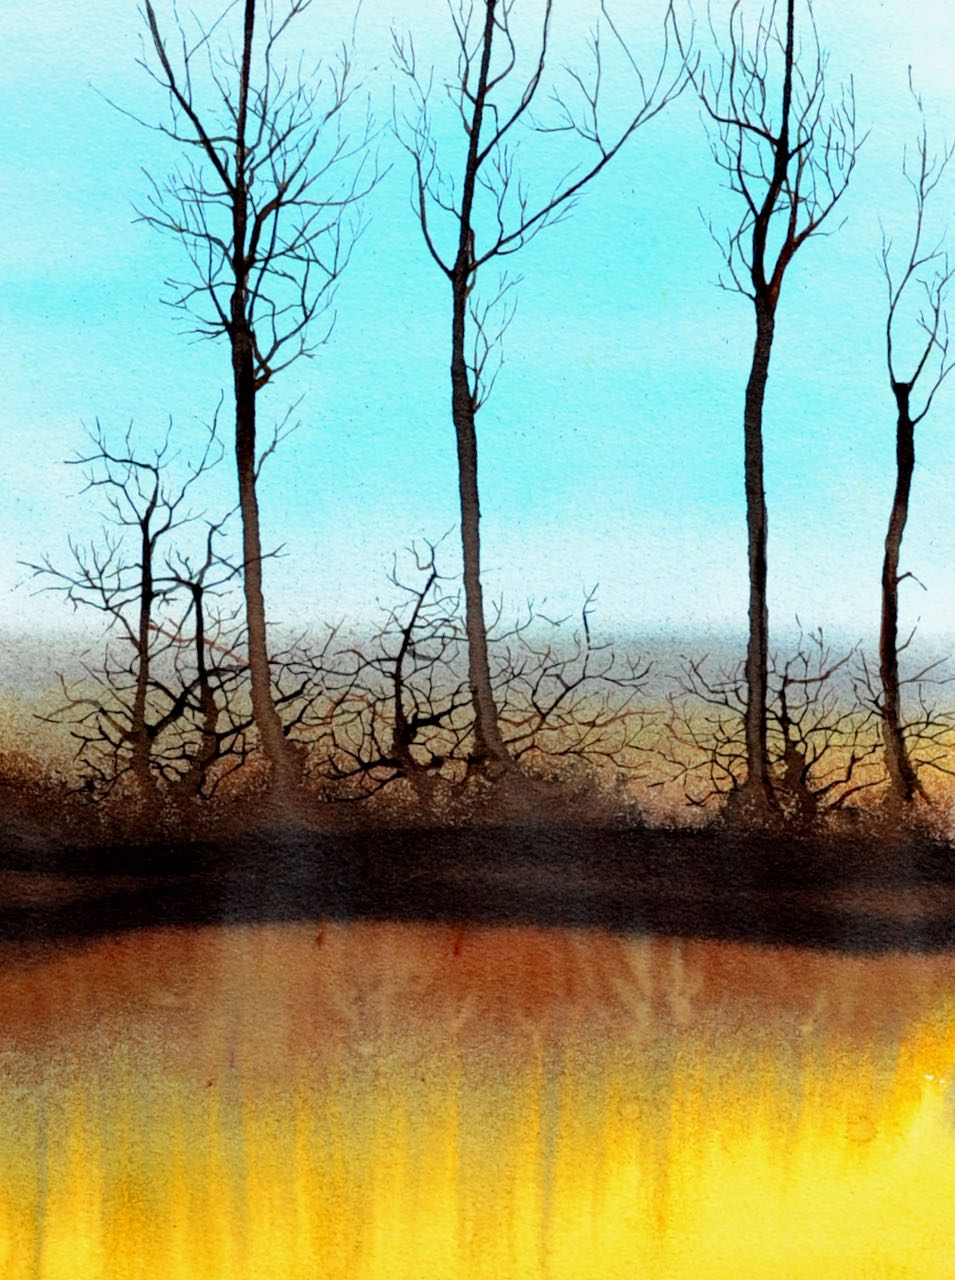 SAH-Winter Tones, watercolour on paper, U/F imageH38xW28cm